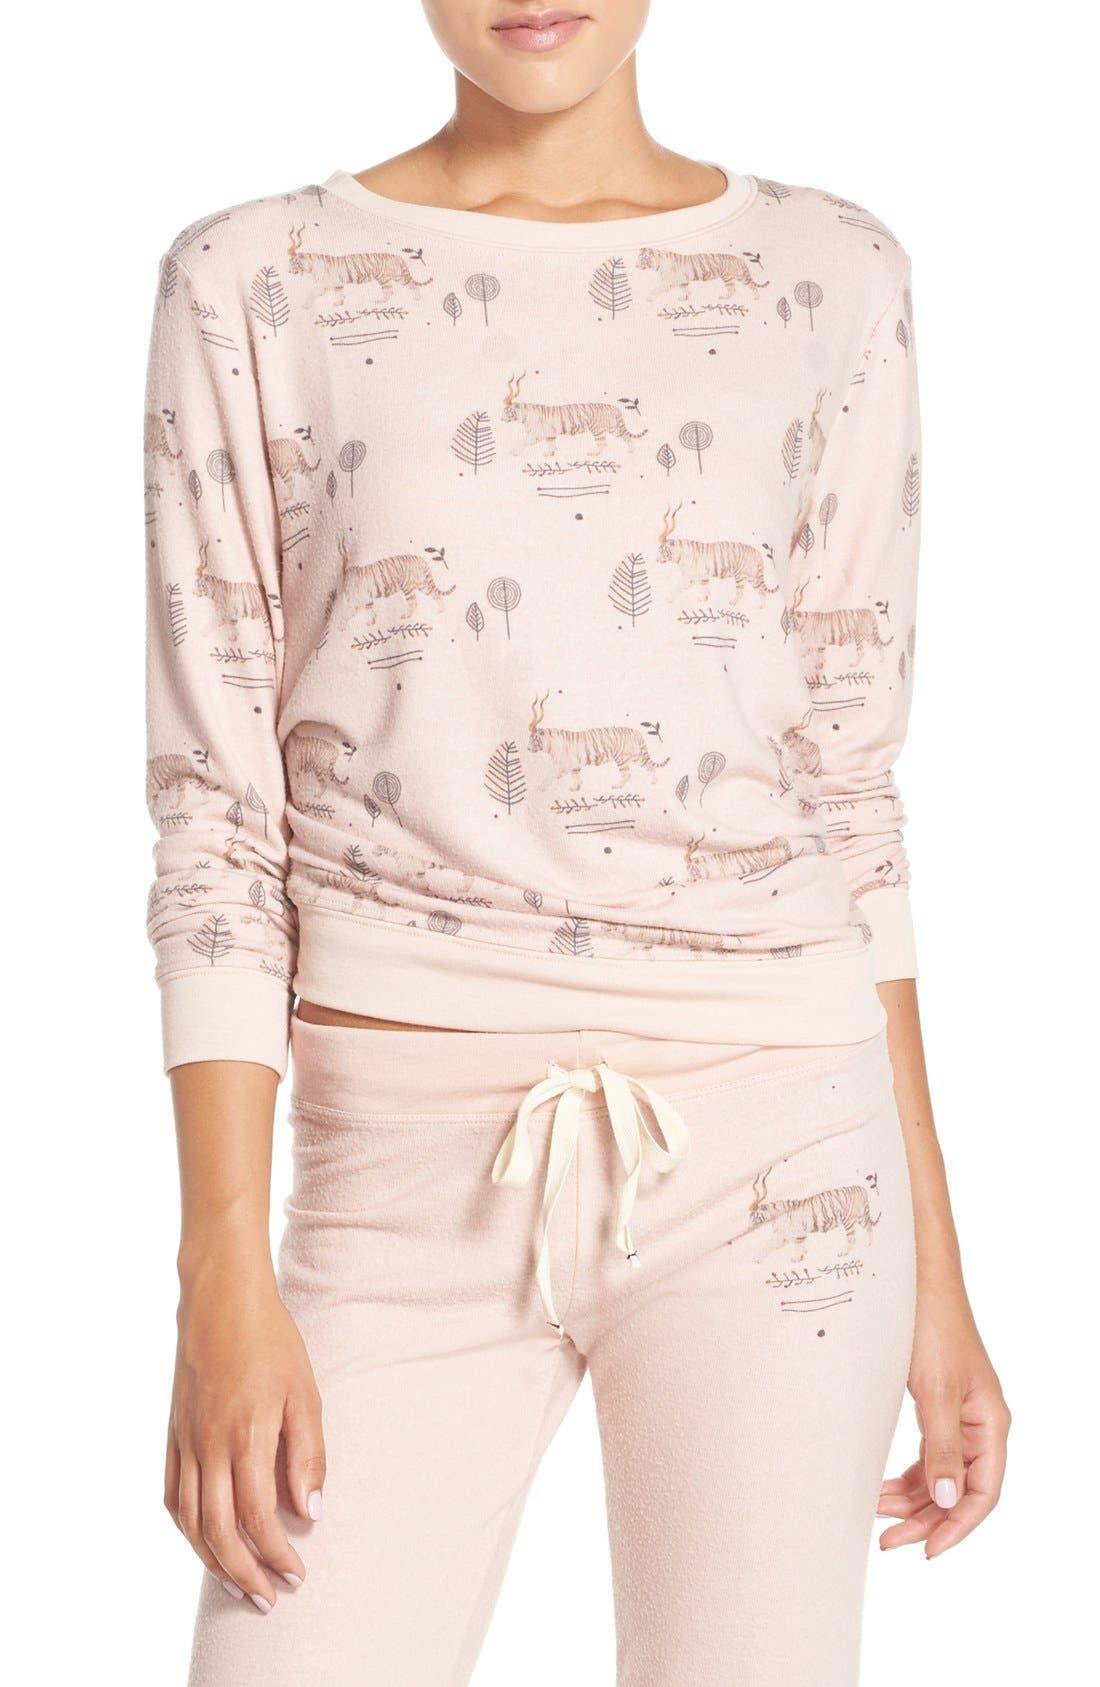 Alternate Image 1 Selected - All Things Fabulous Tiger Print Sweatshirt